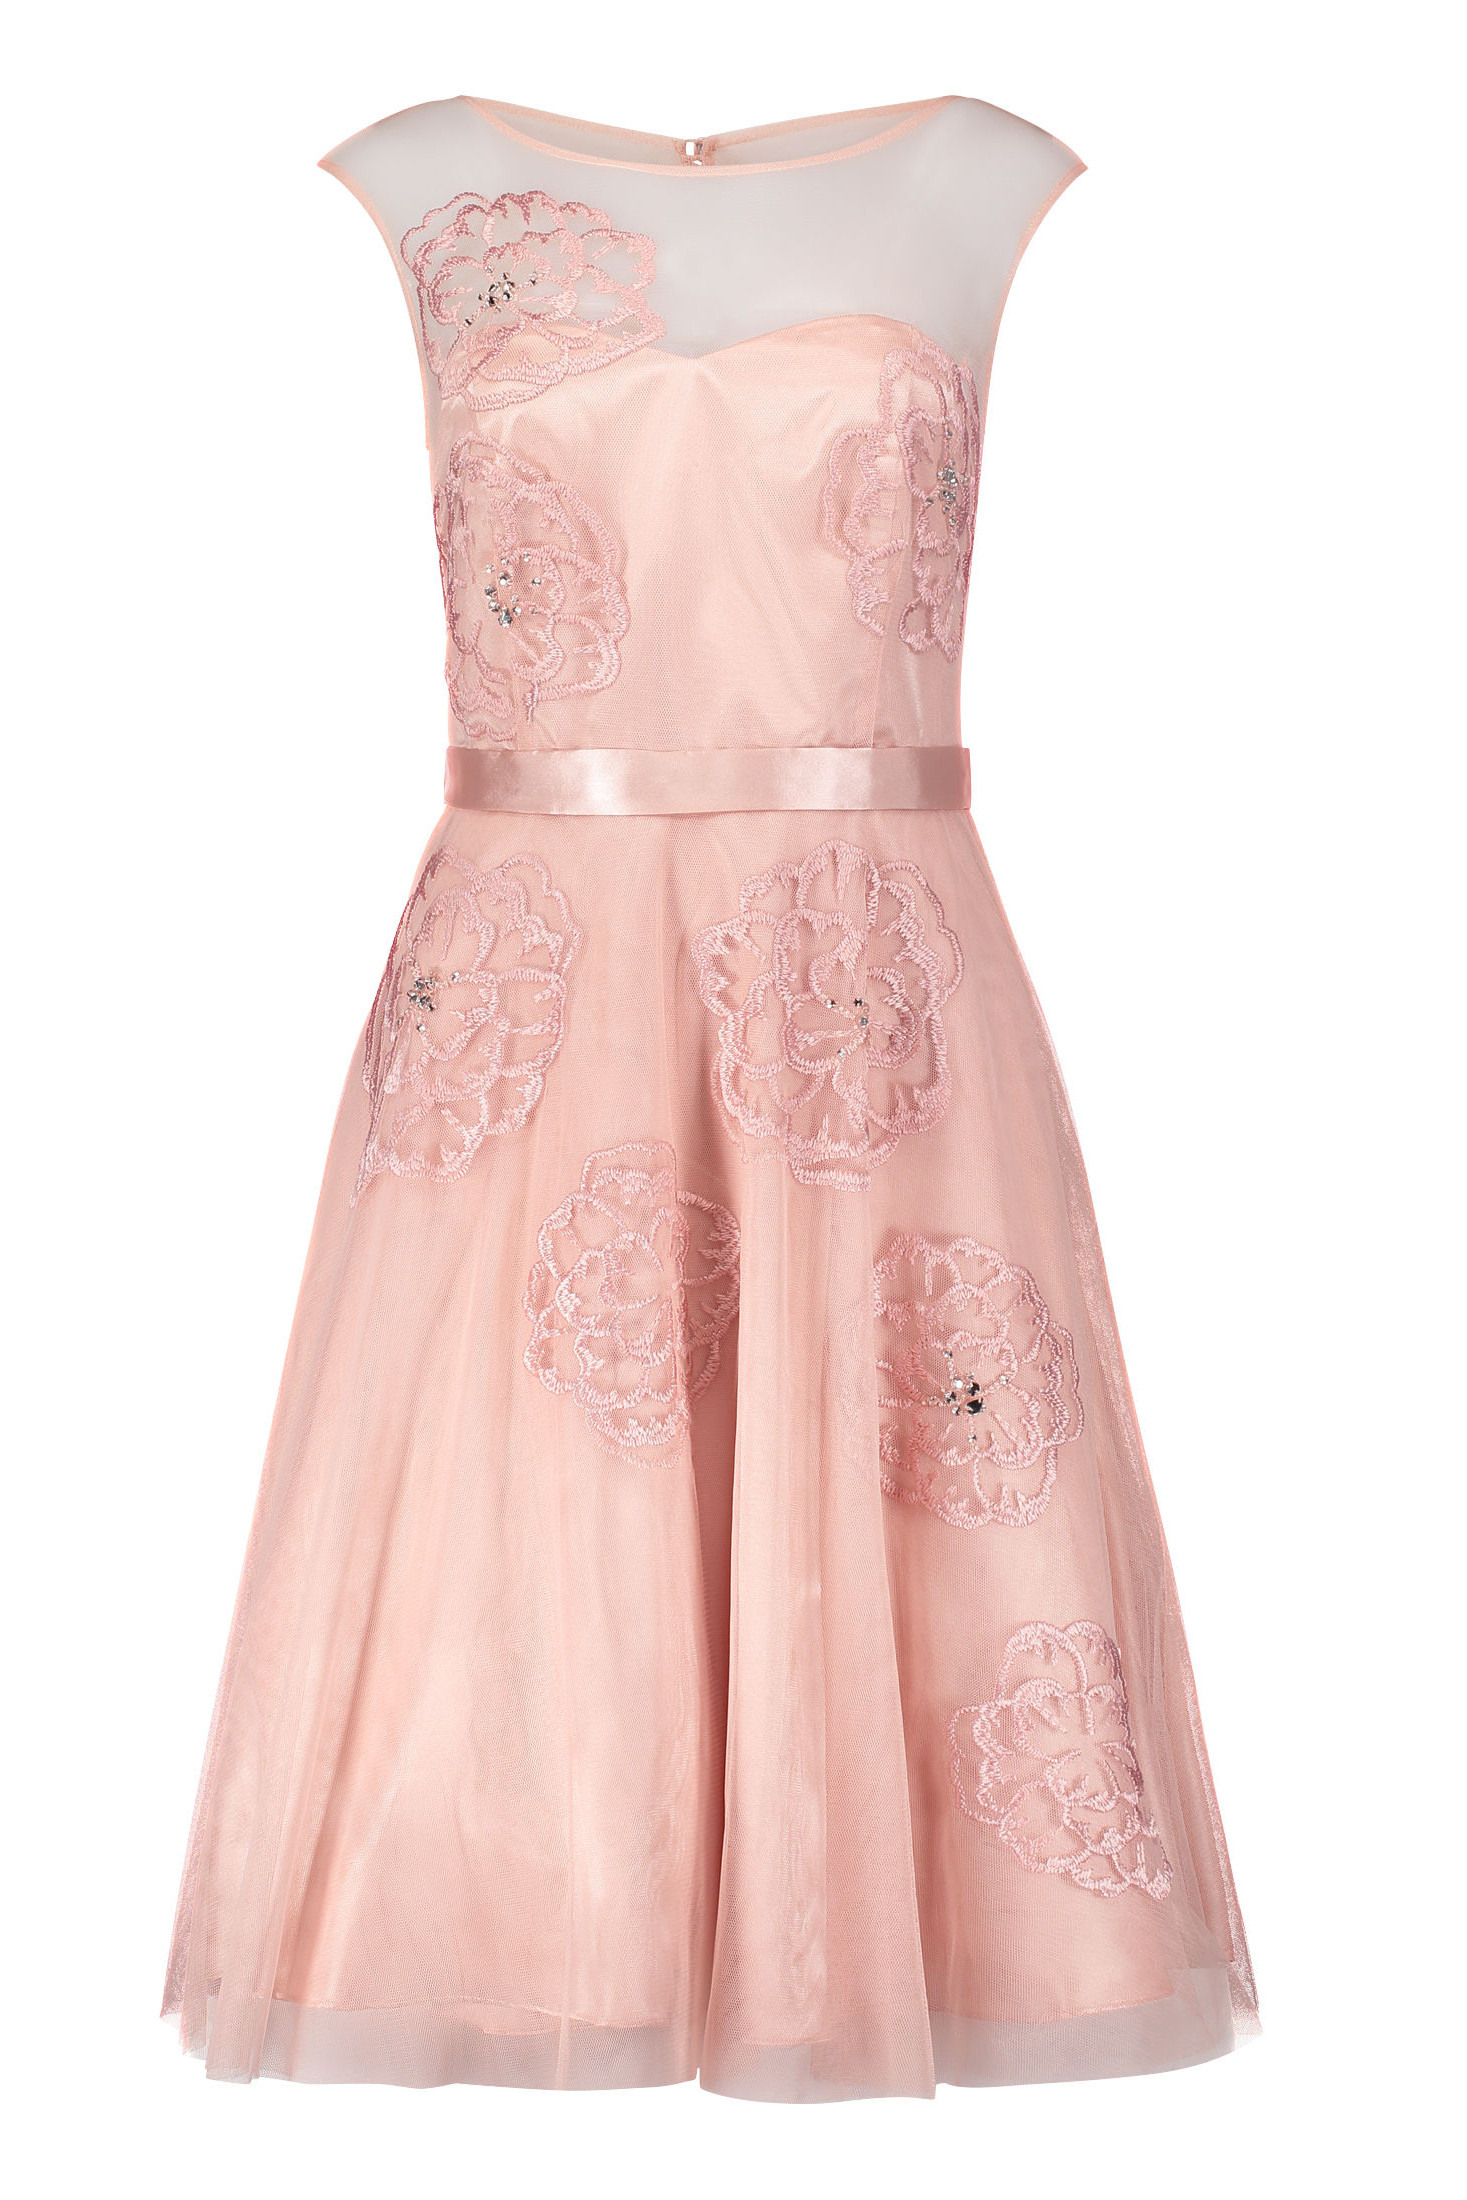 10 Einfach Abendkleid Knielang Stylish20 Cool Abendkleid Knielang Spezialgebiet